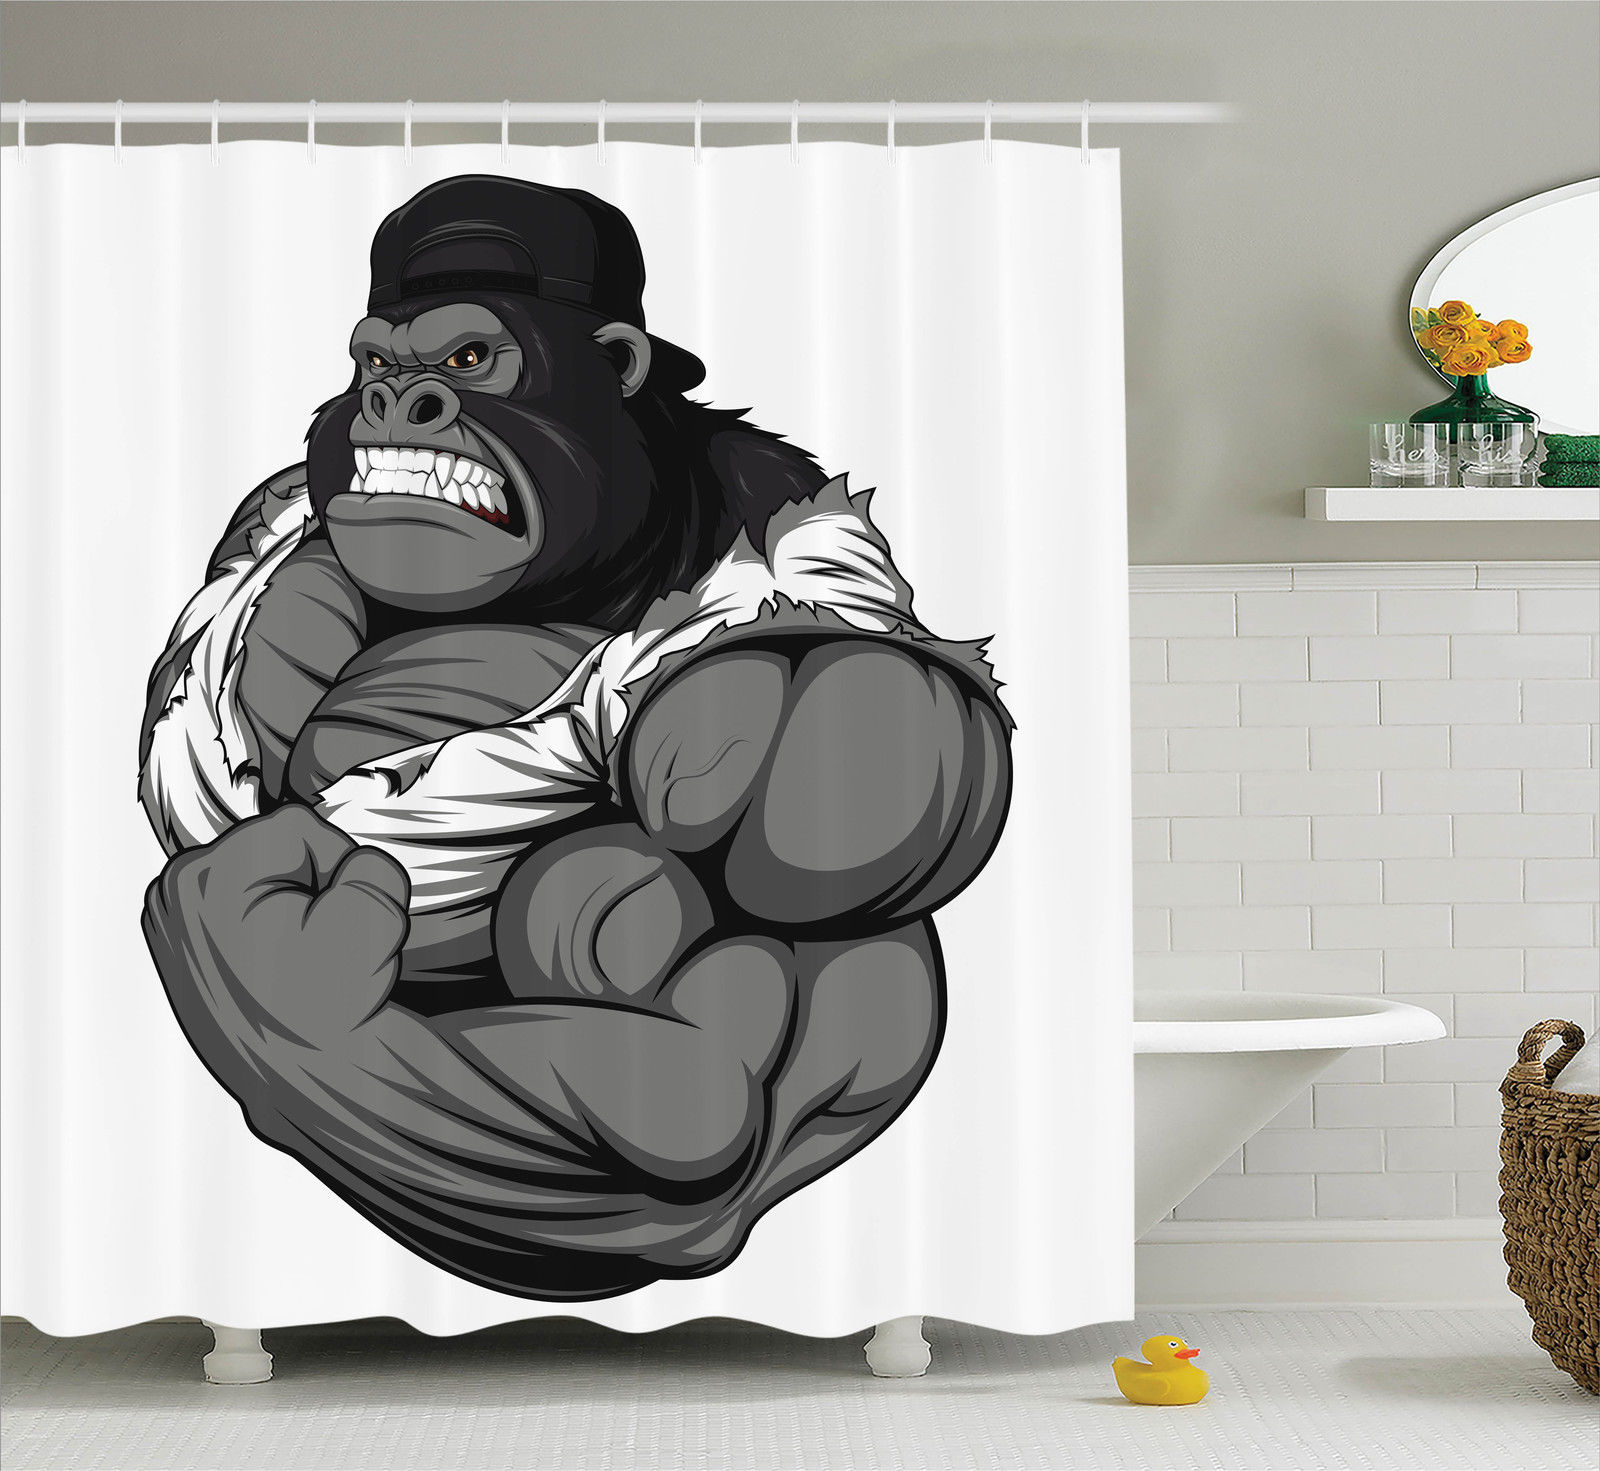 Cartoon Decor Shower Curtain Set, Illustration Of Big Gorilla Like As Professional Athlete Bodybuilding Gym Animal, Bathroom Accessories, 69W X 70L Inches, By Ambesonne